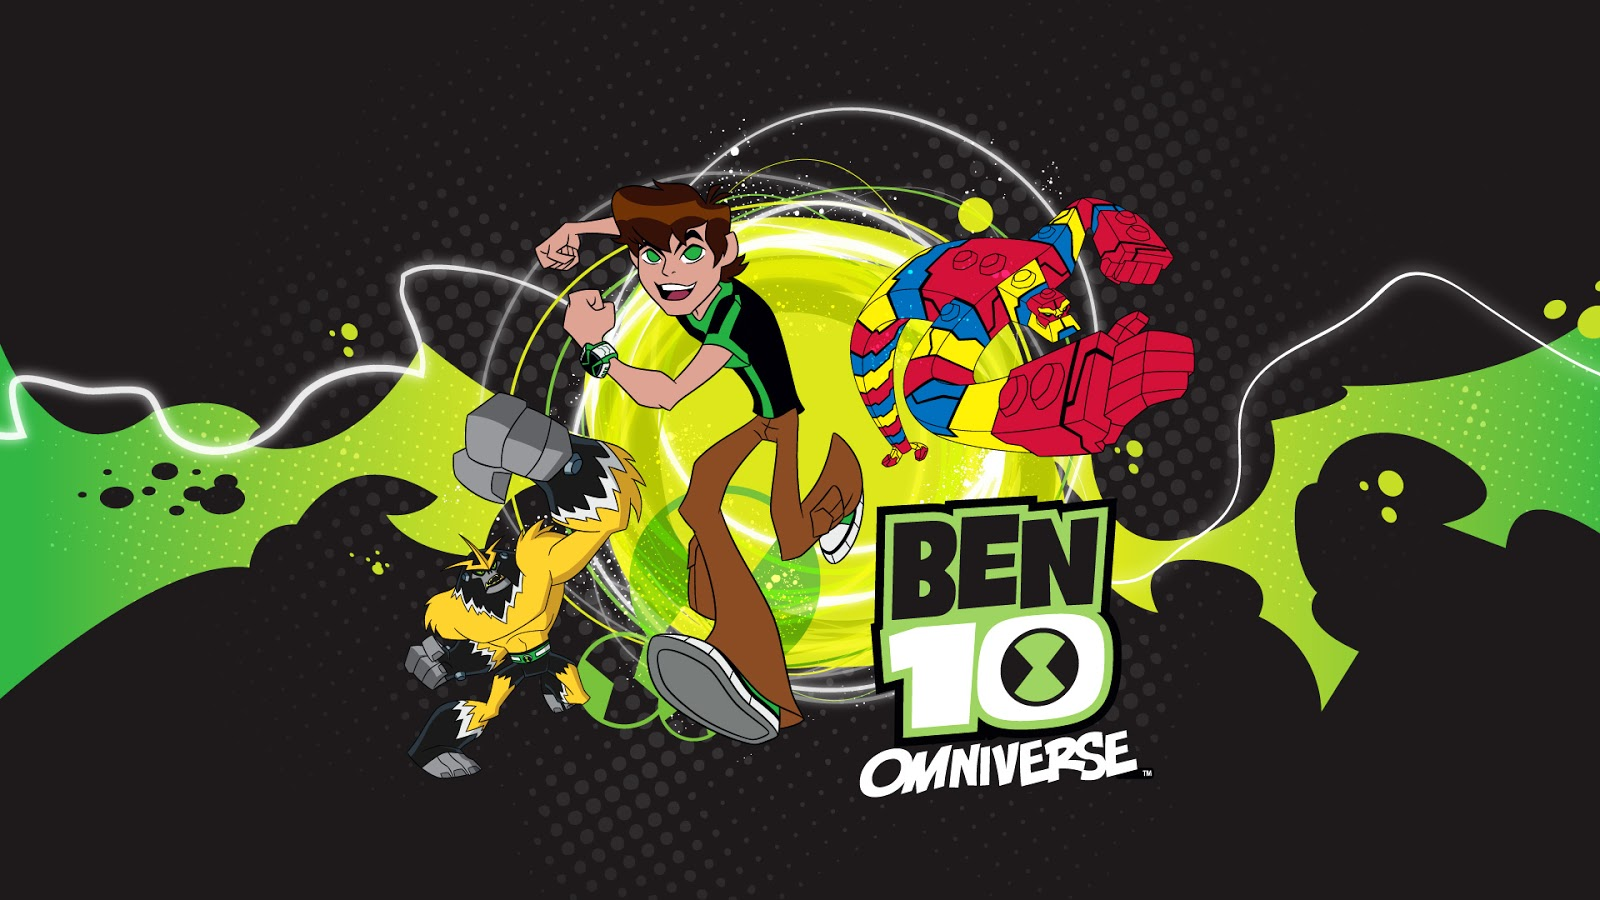 Ben 10 Omniverse Dublado 18